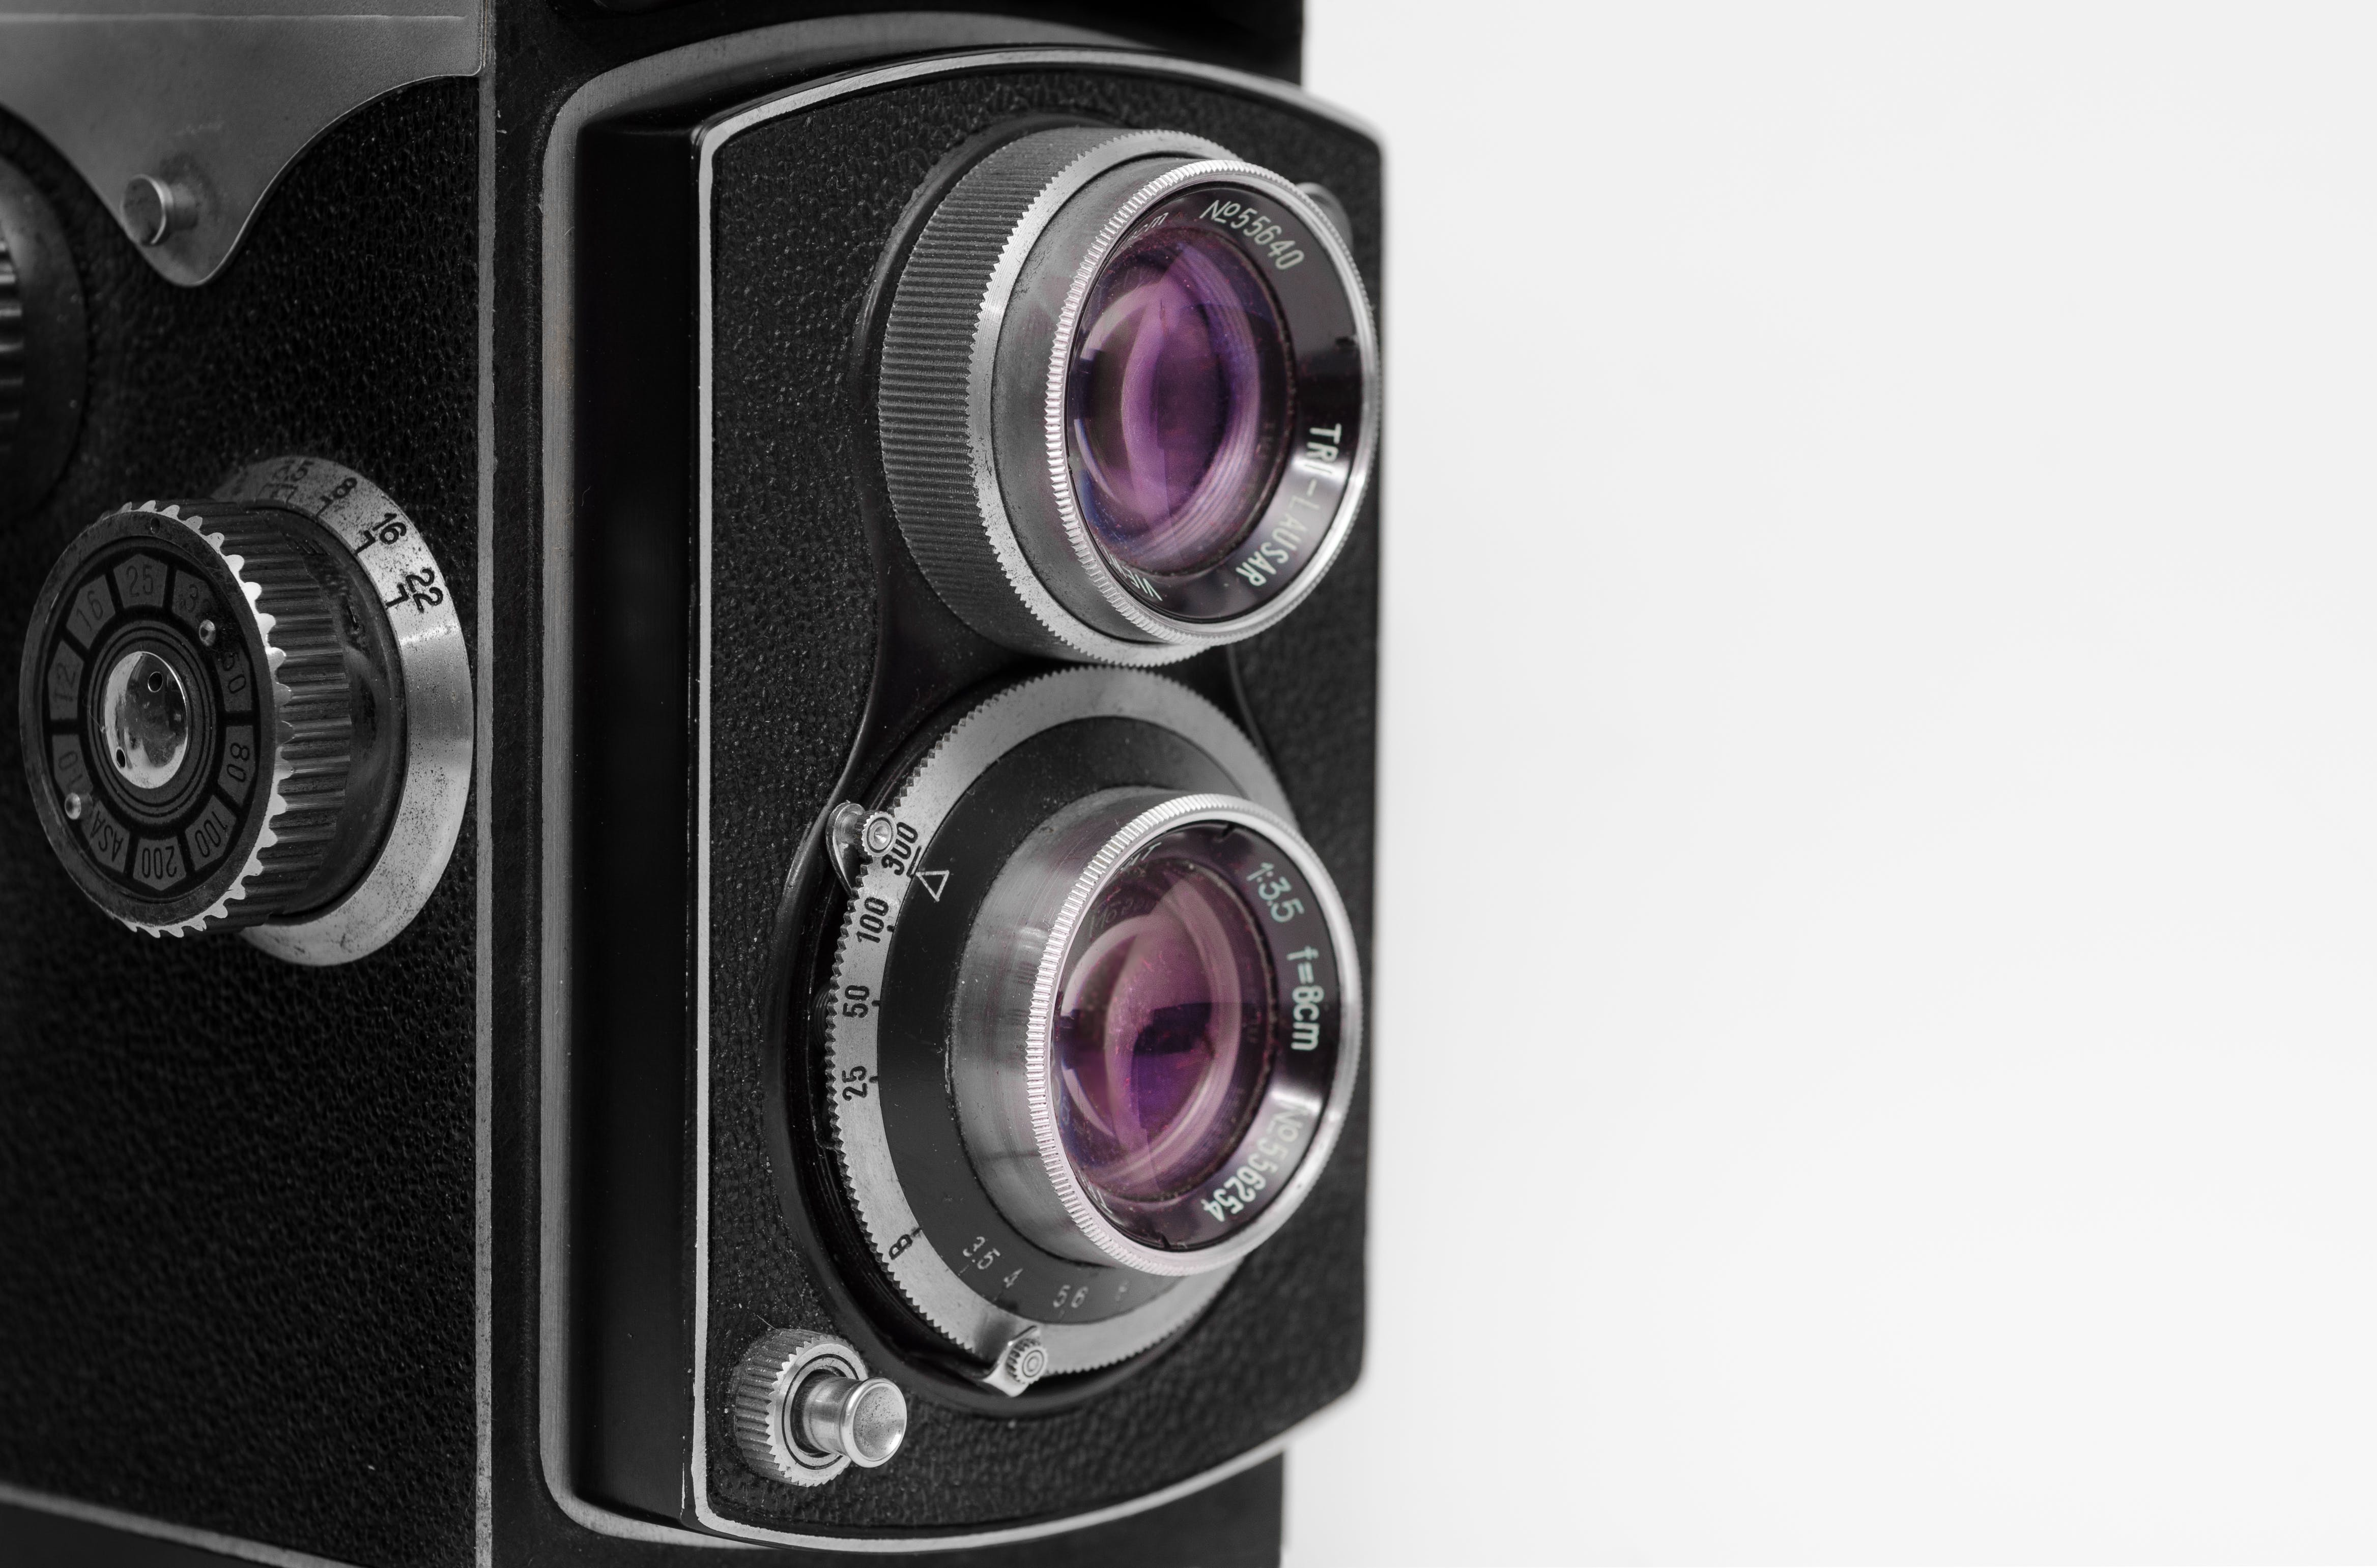 Gratis arkivbilde med Analog, blenderåpning, fokus, kamera